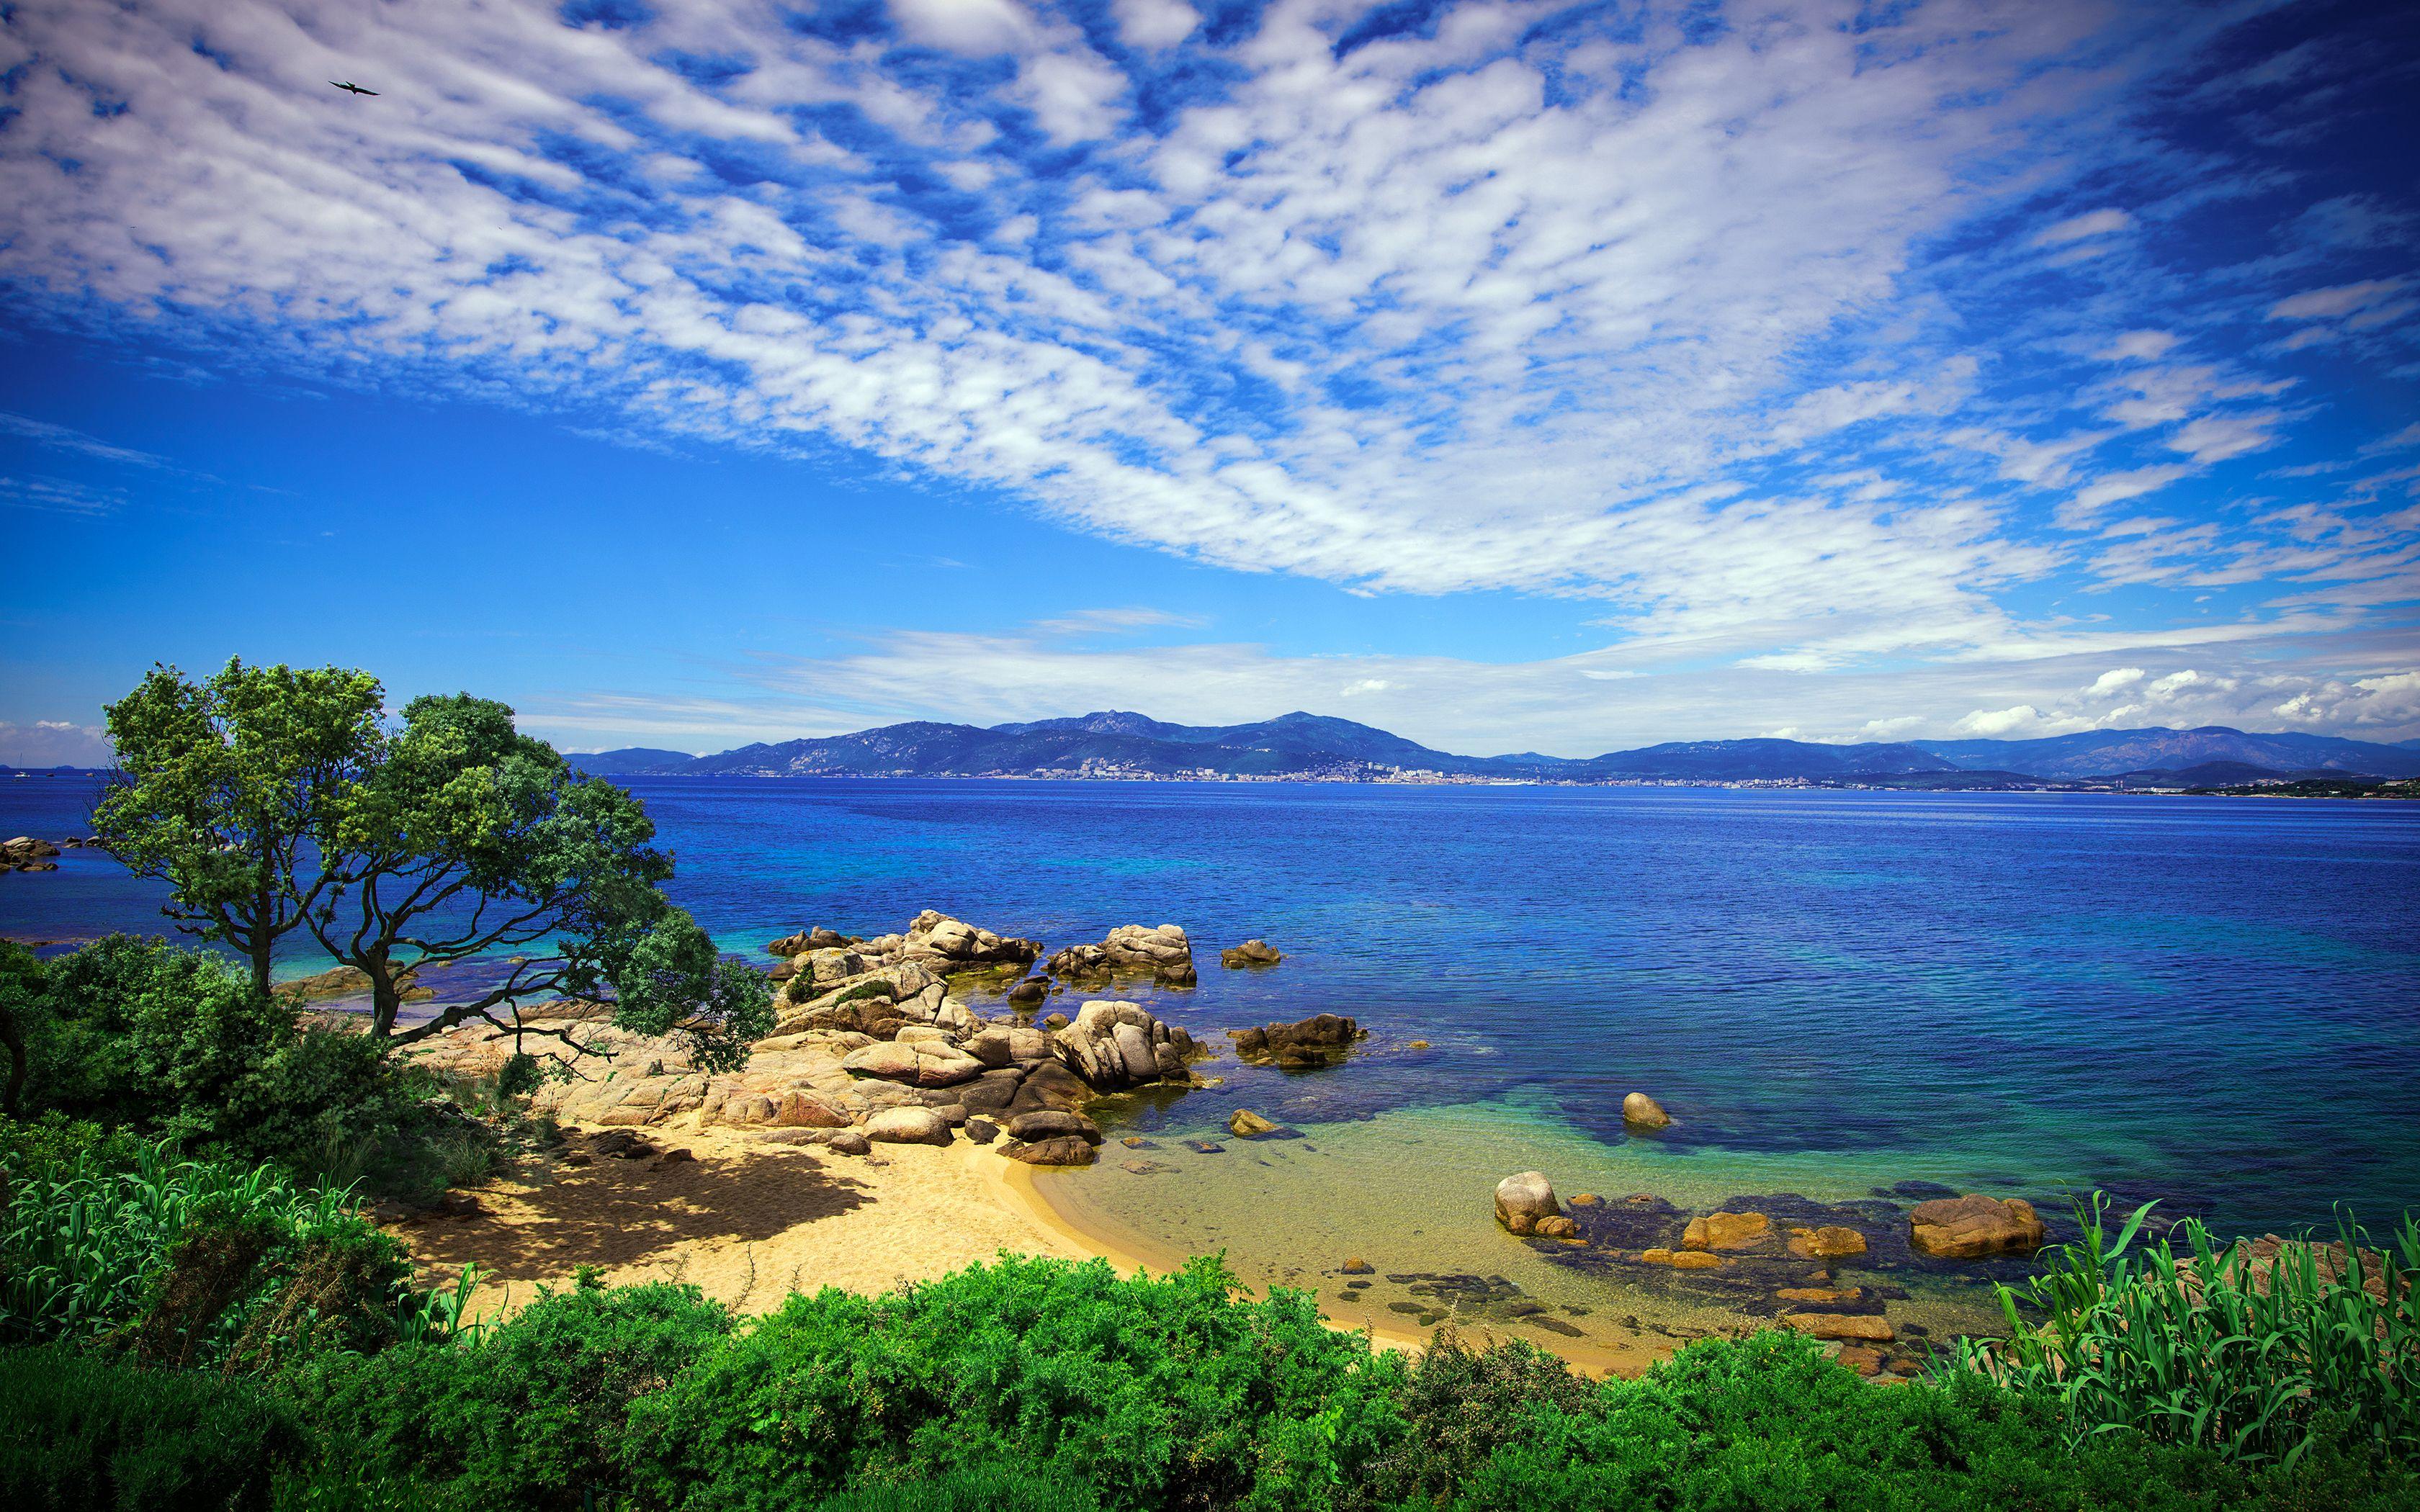 Corsica Beach Wallpaper Earth Pictures Beach Landscape